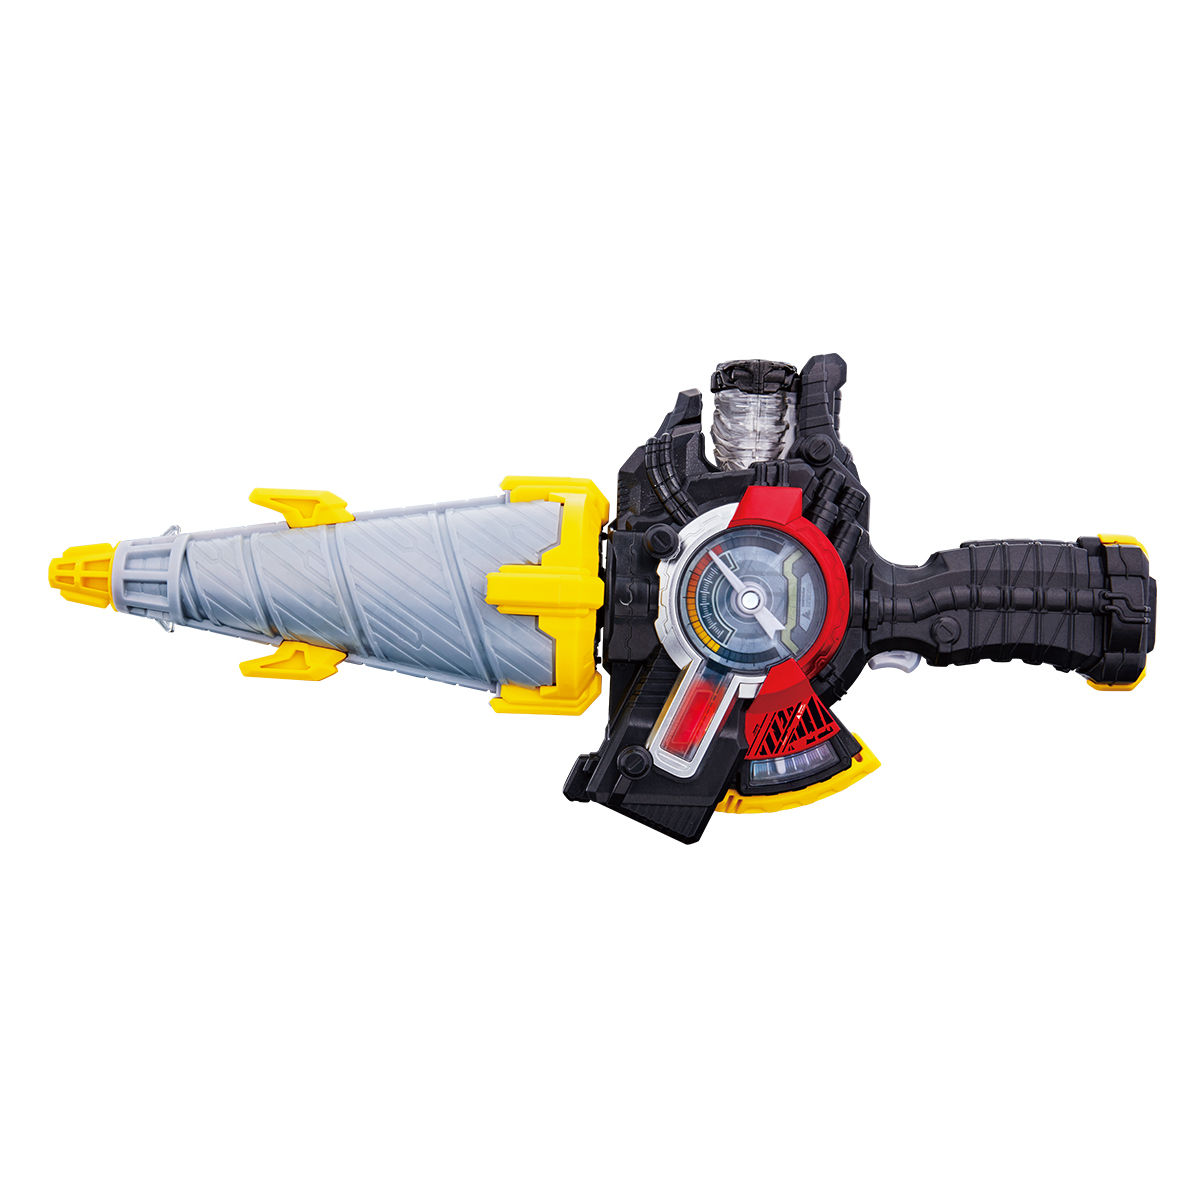 Image 5 - Kamens ライダー構築ドリル Smasher DX 武器リンクすることがフルボトルアクション図クリスマスギフト子供のためのアクション & トイ フィギュア   -